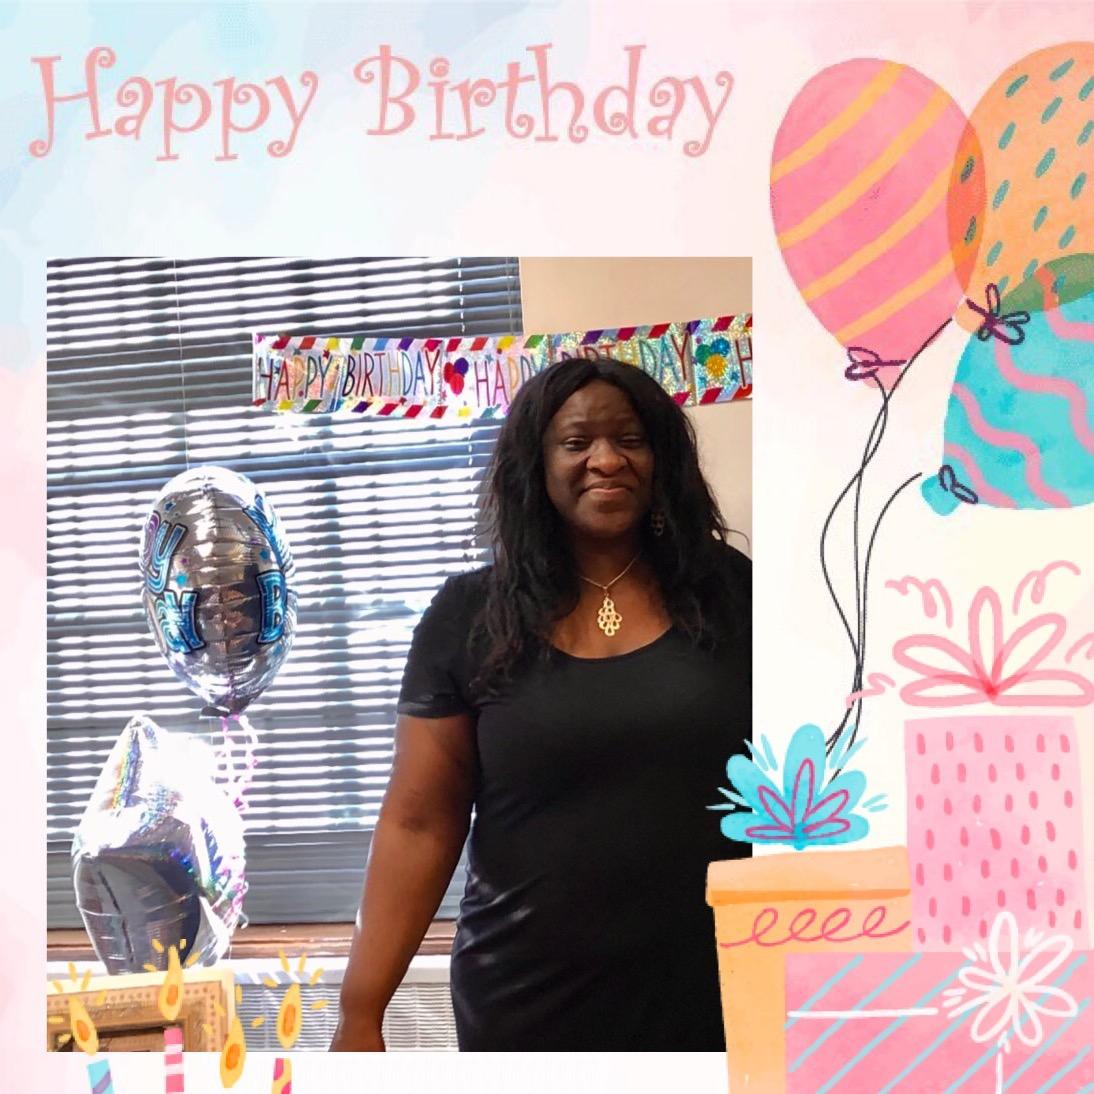 Happy Birthday Sister Catherine!! You